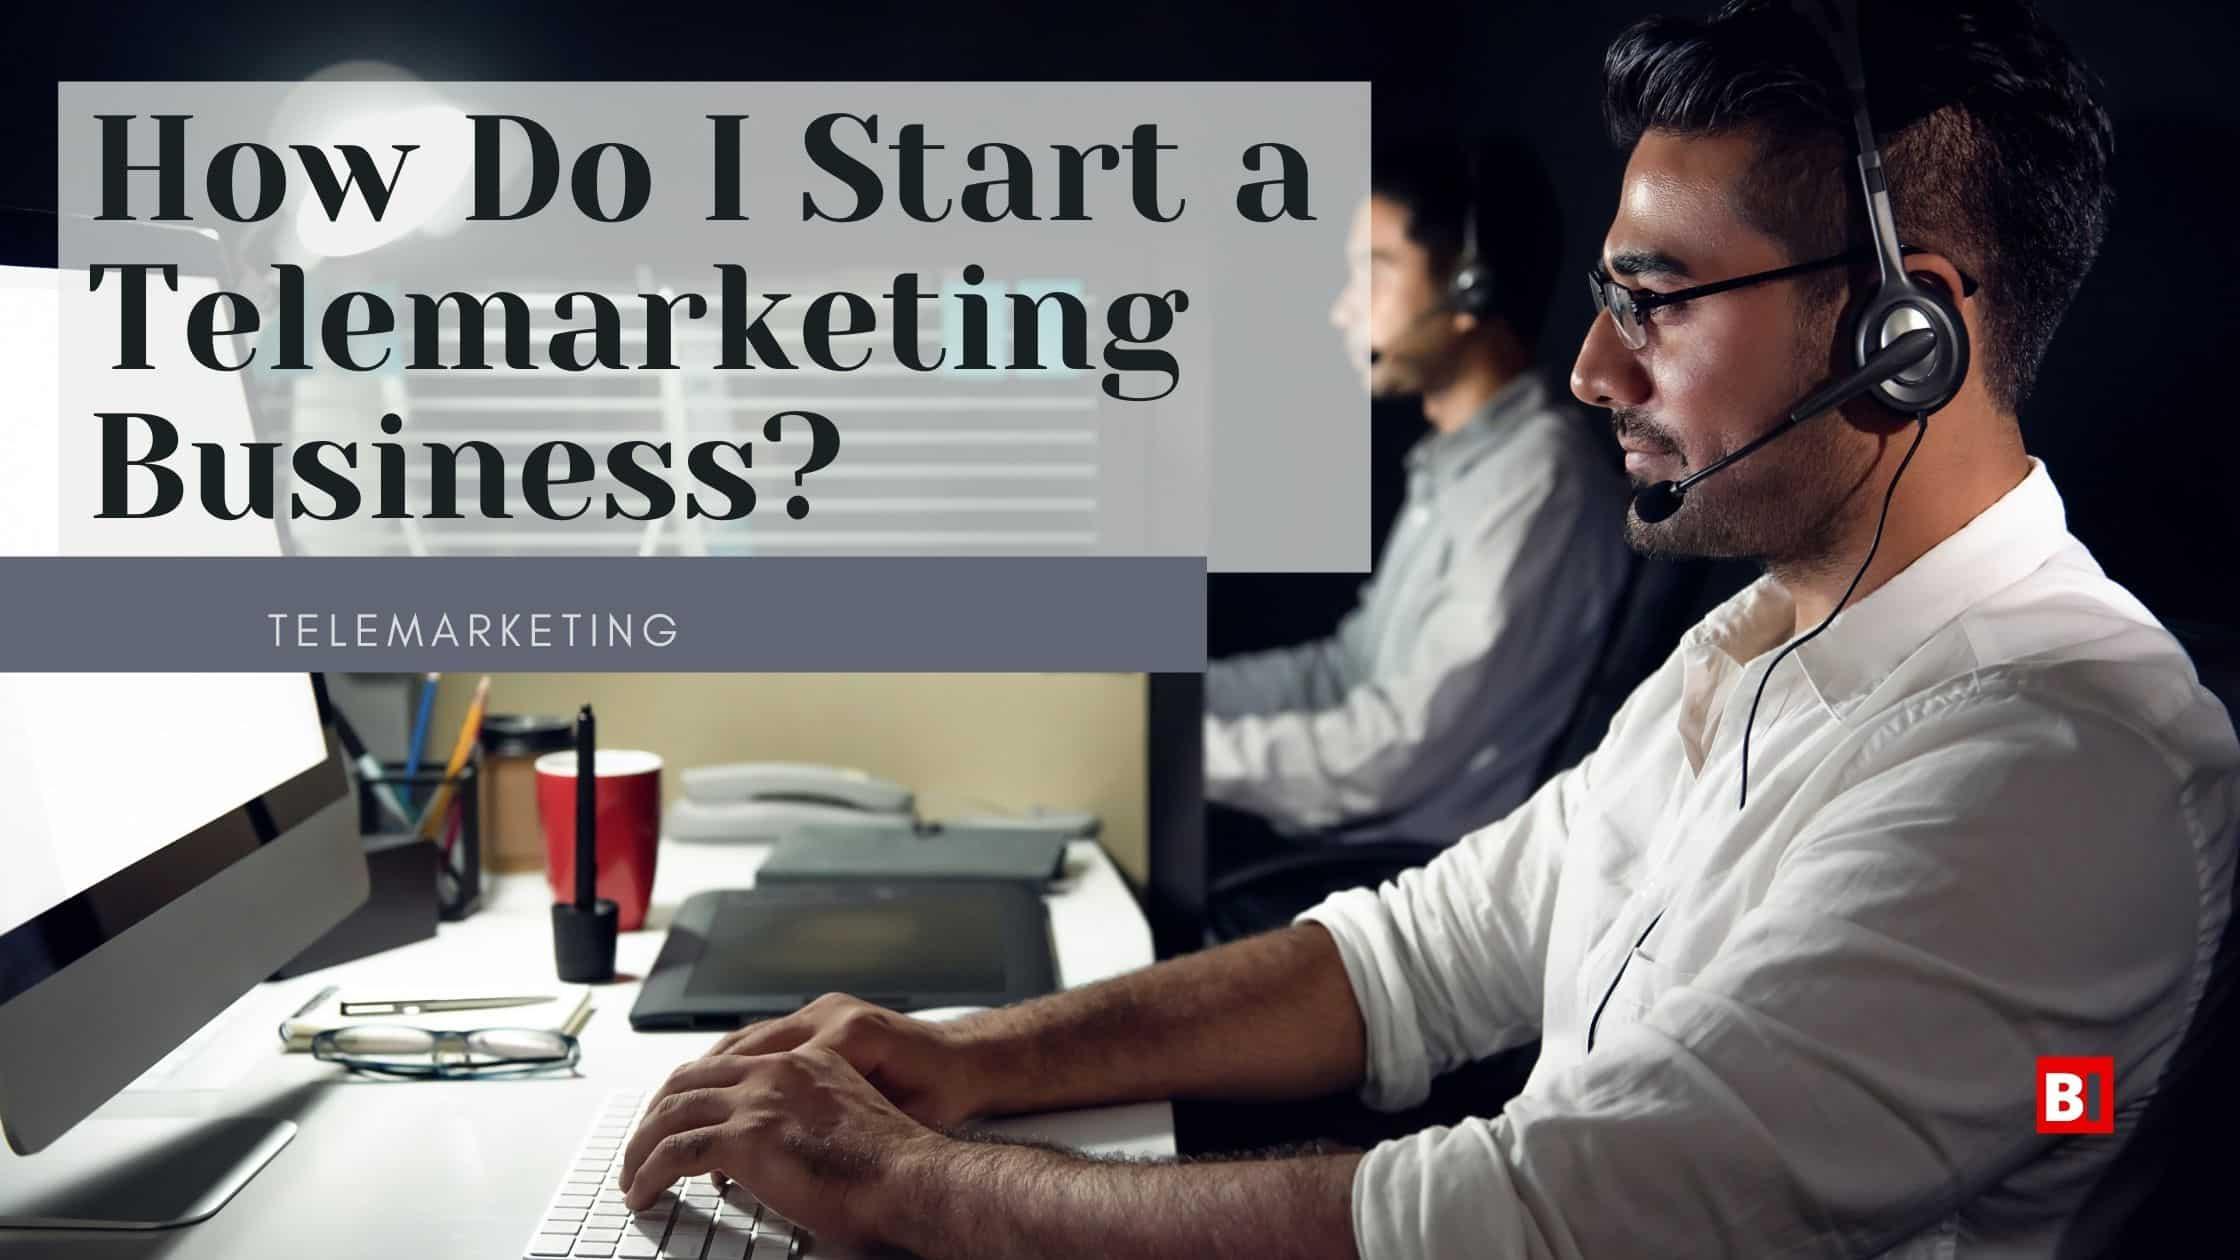 how do i start a telemarketing business